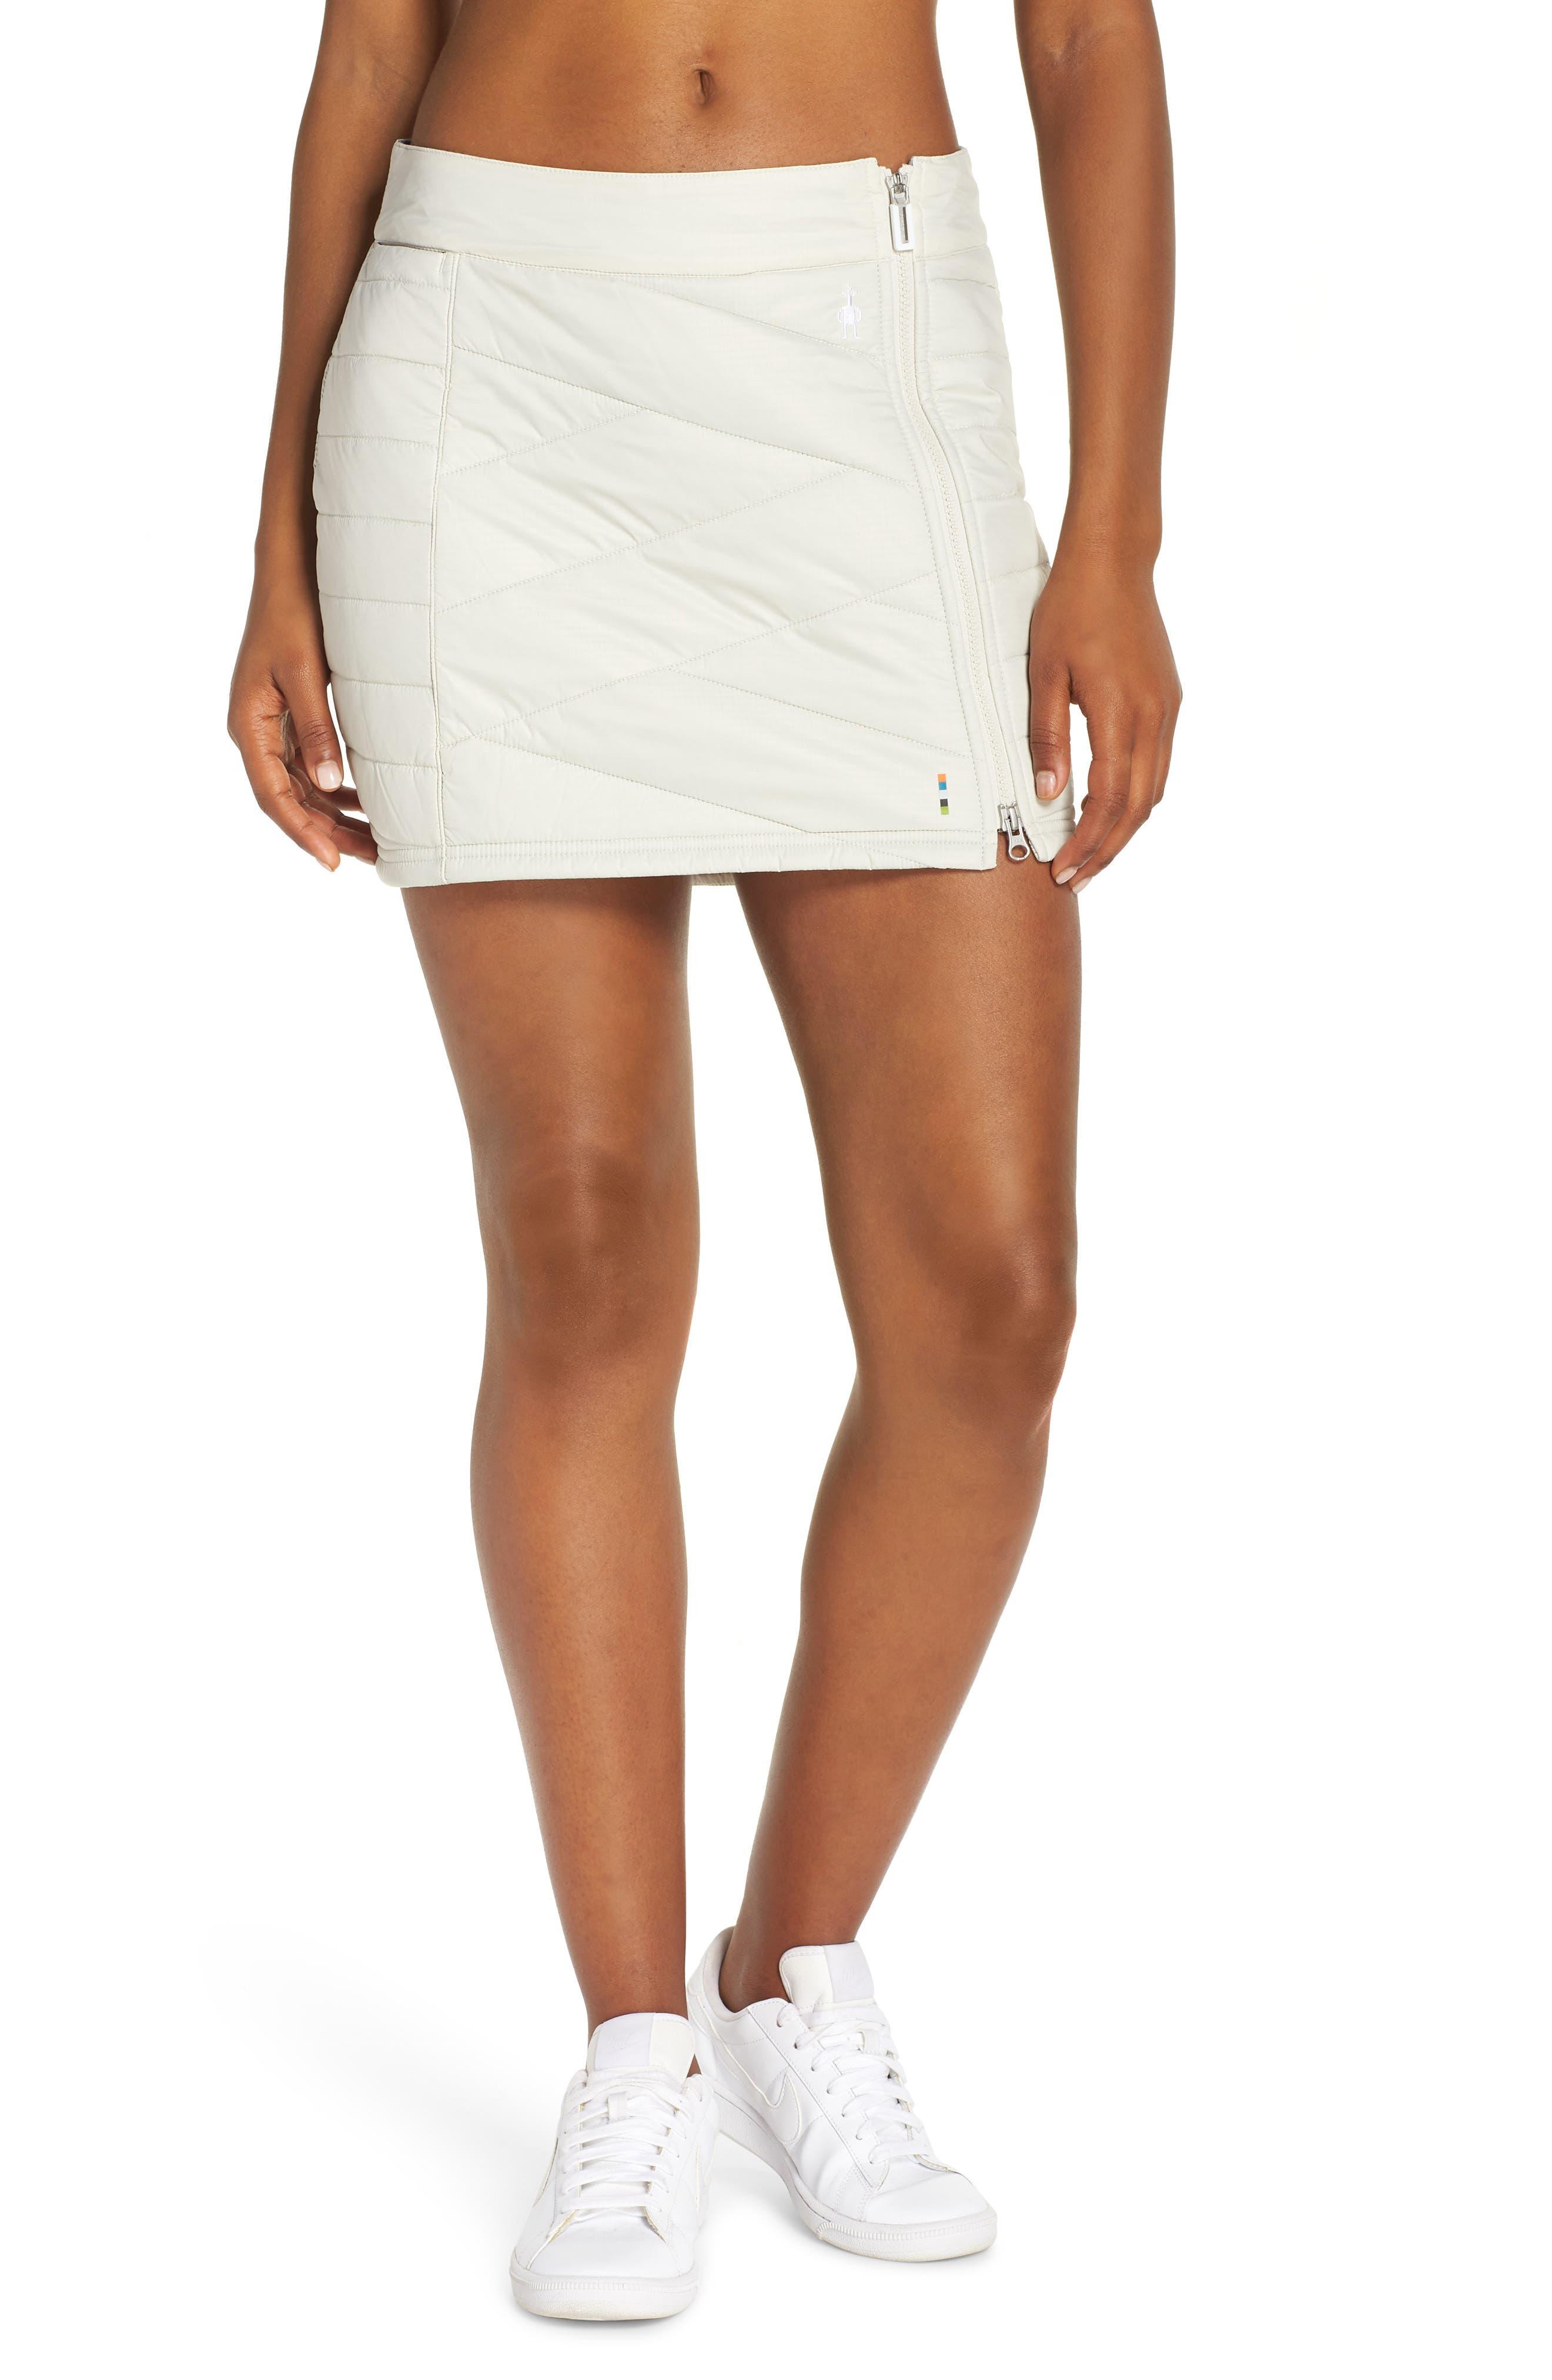 SMARTWOOL Smartloft 120 Quilted Skirt, Main, color, 025